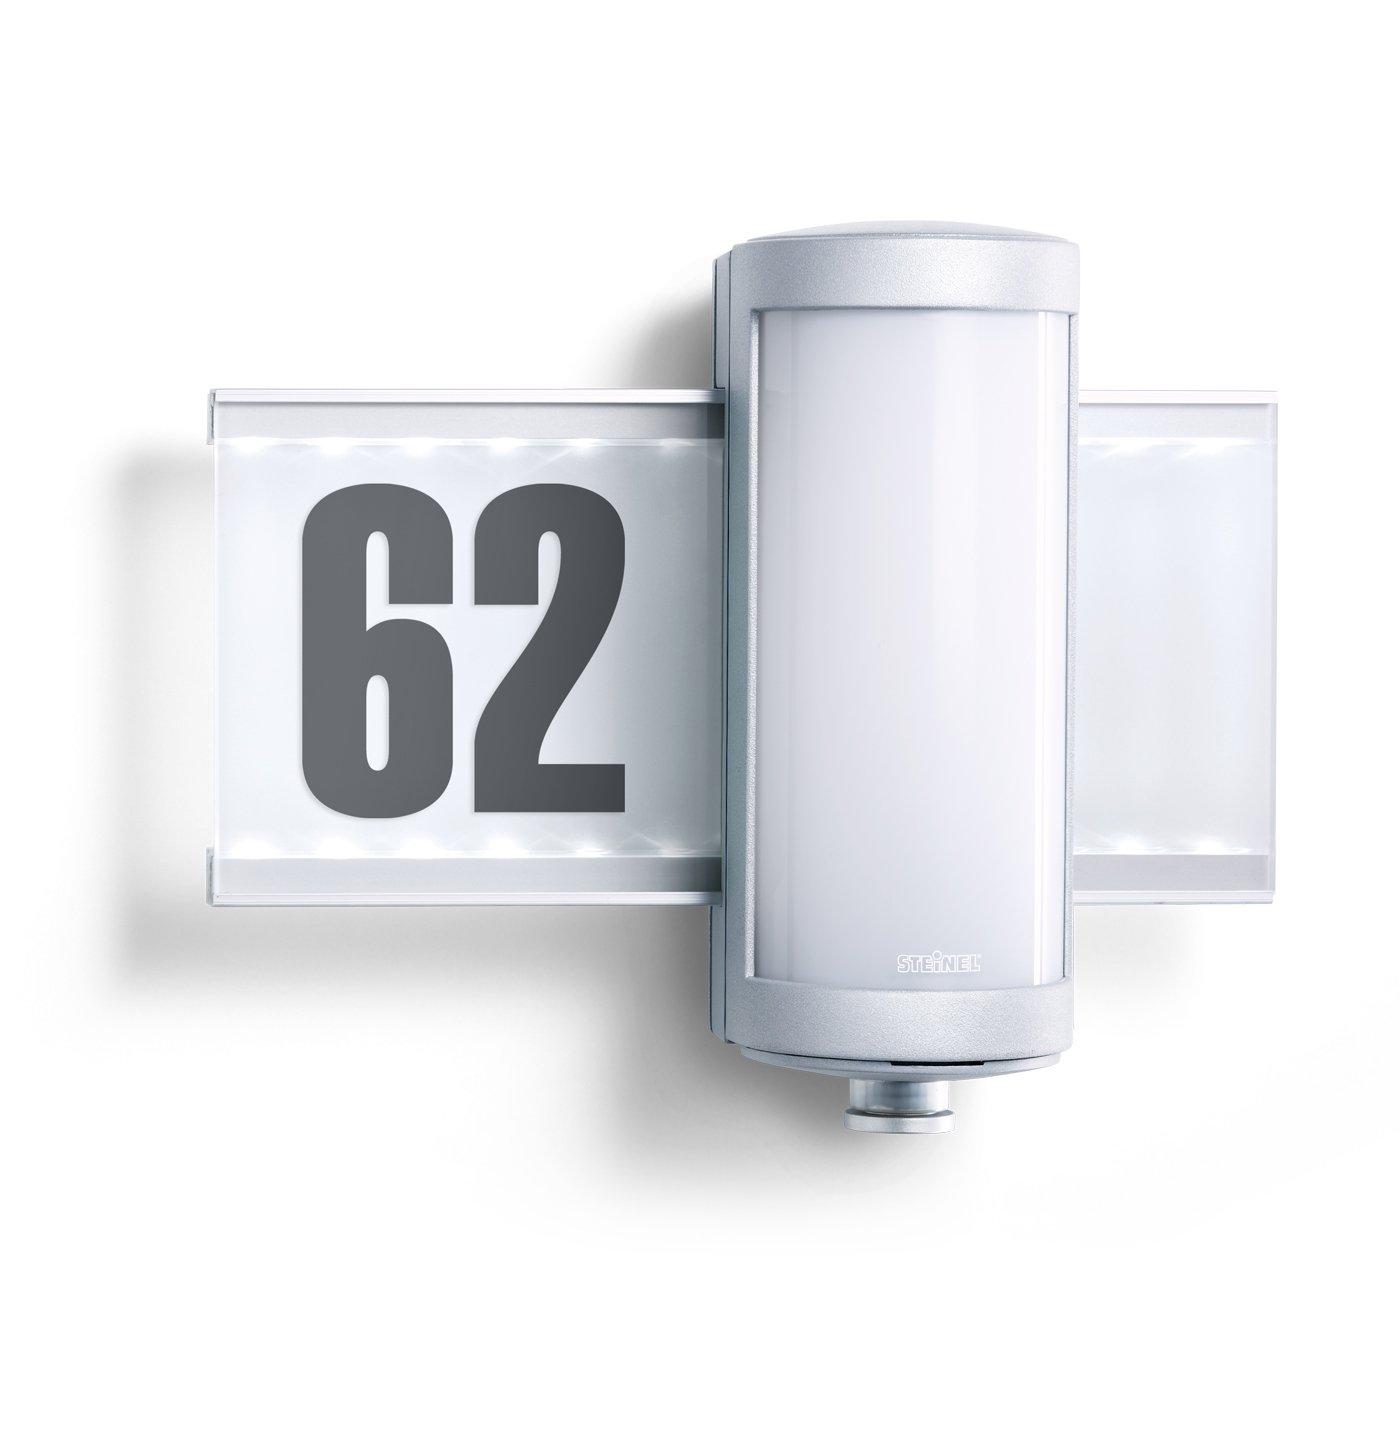 Steinel LED Außenwandleuchte L 625 LED, 155 lm, inkl. Hausnummern ...